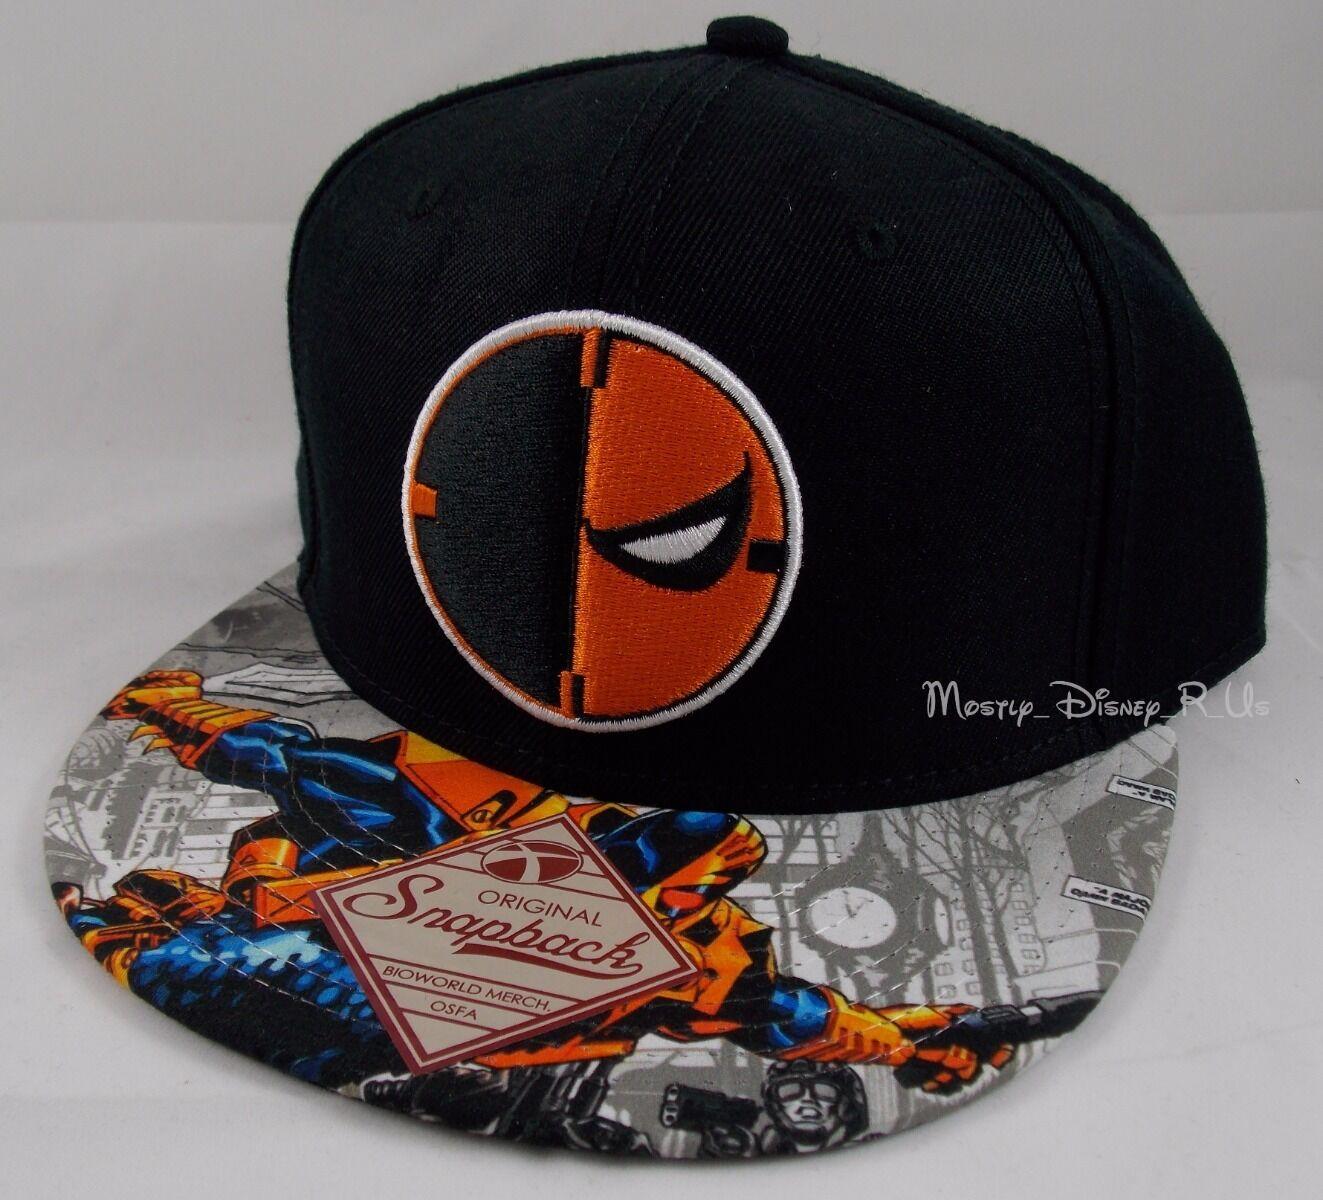 best deals on 7ad94 b2ce1 New DC Comics Deathstroke Logo Snapback Hat Ball Cap Sublimated Print Bill  фото